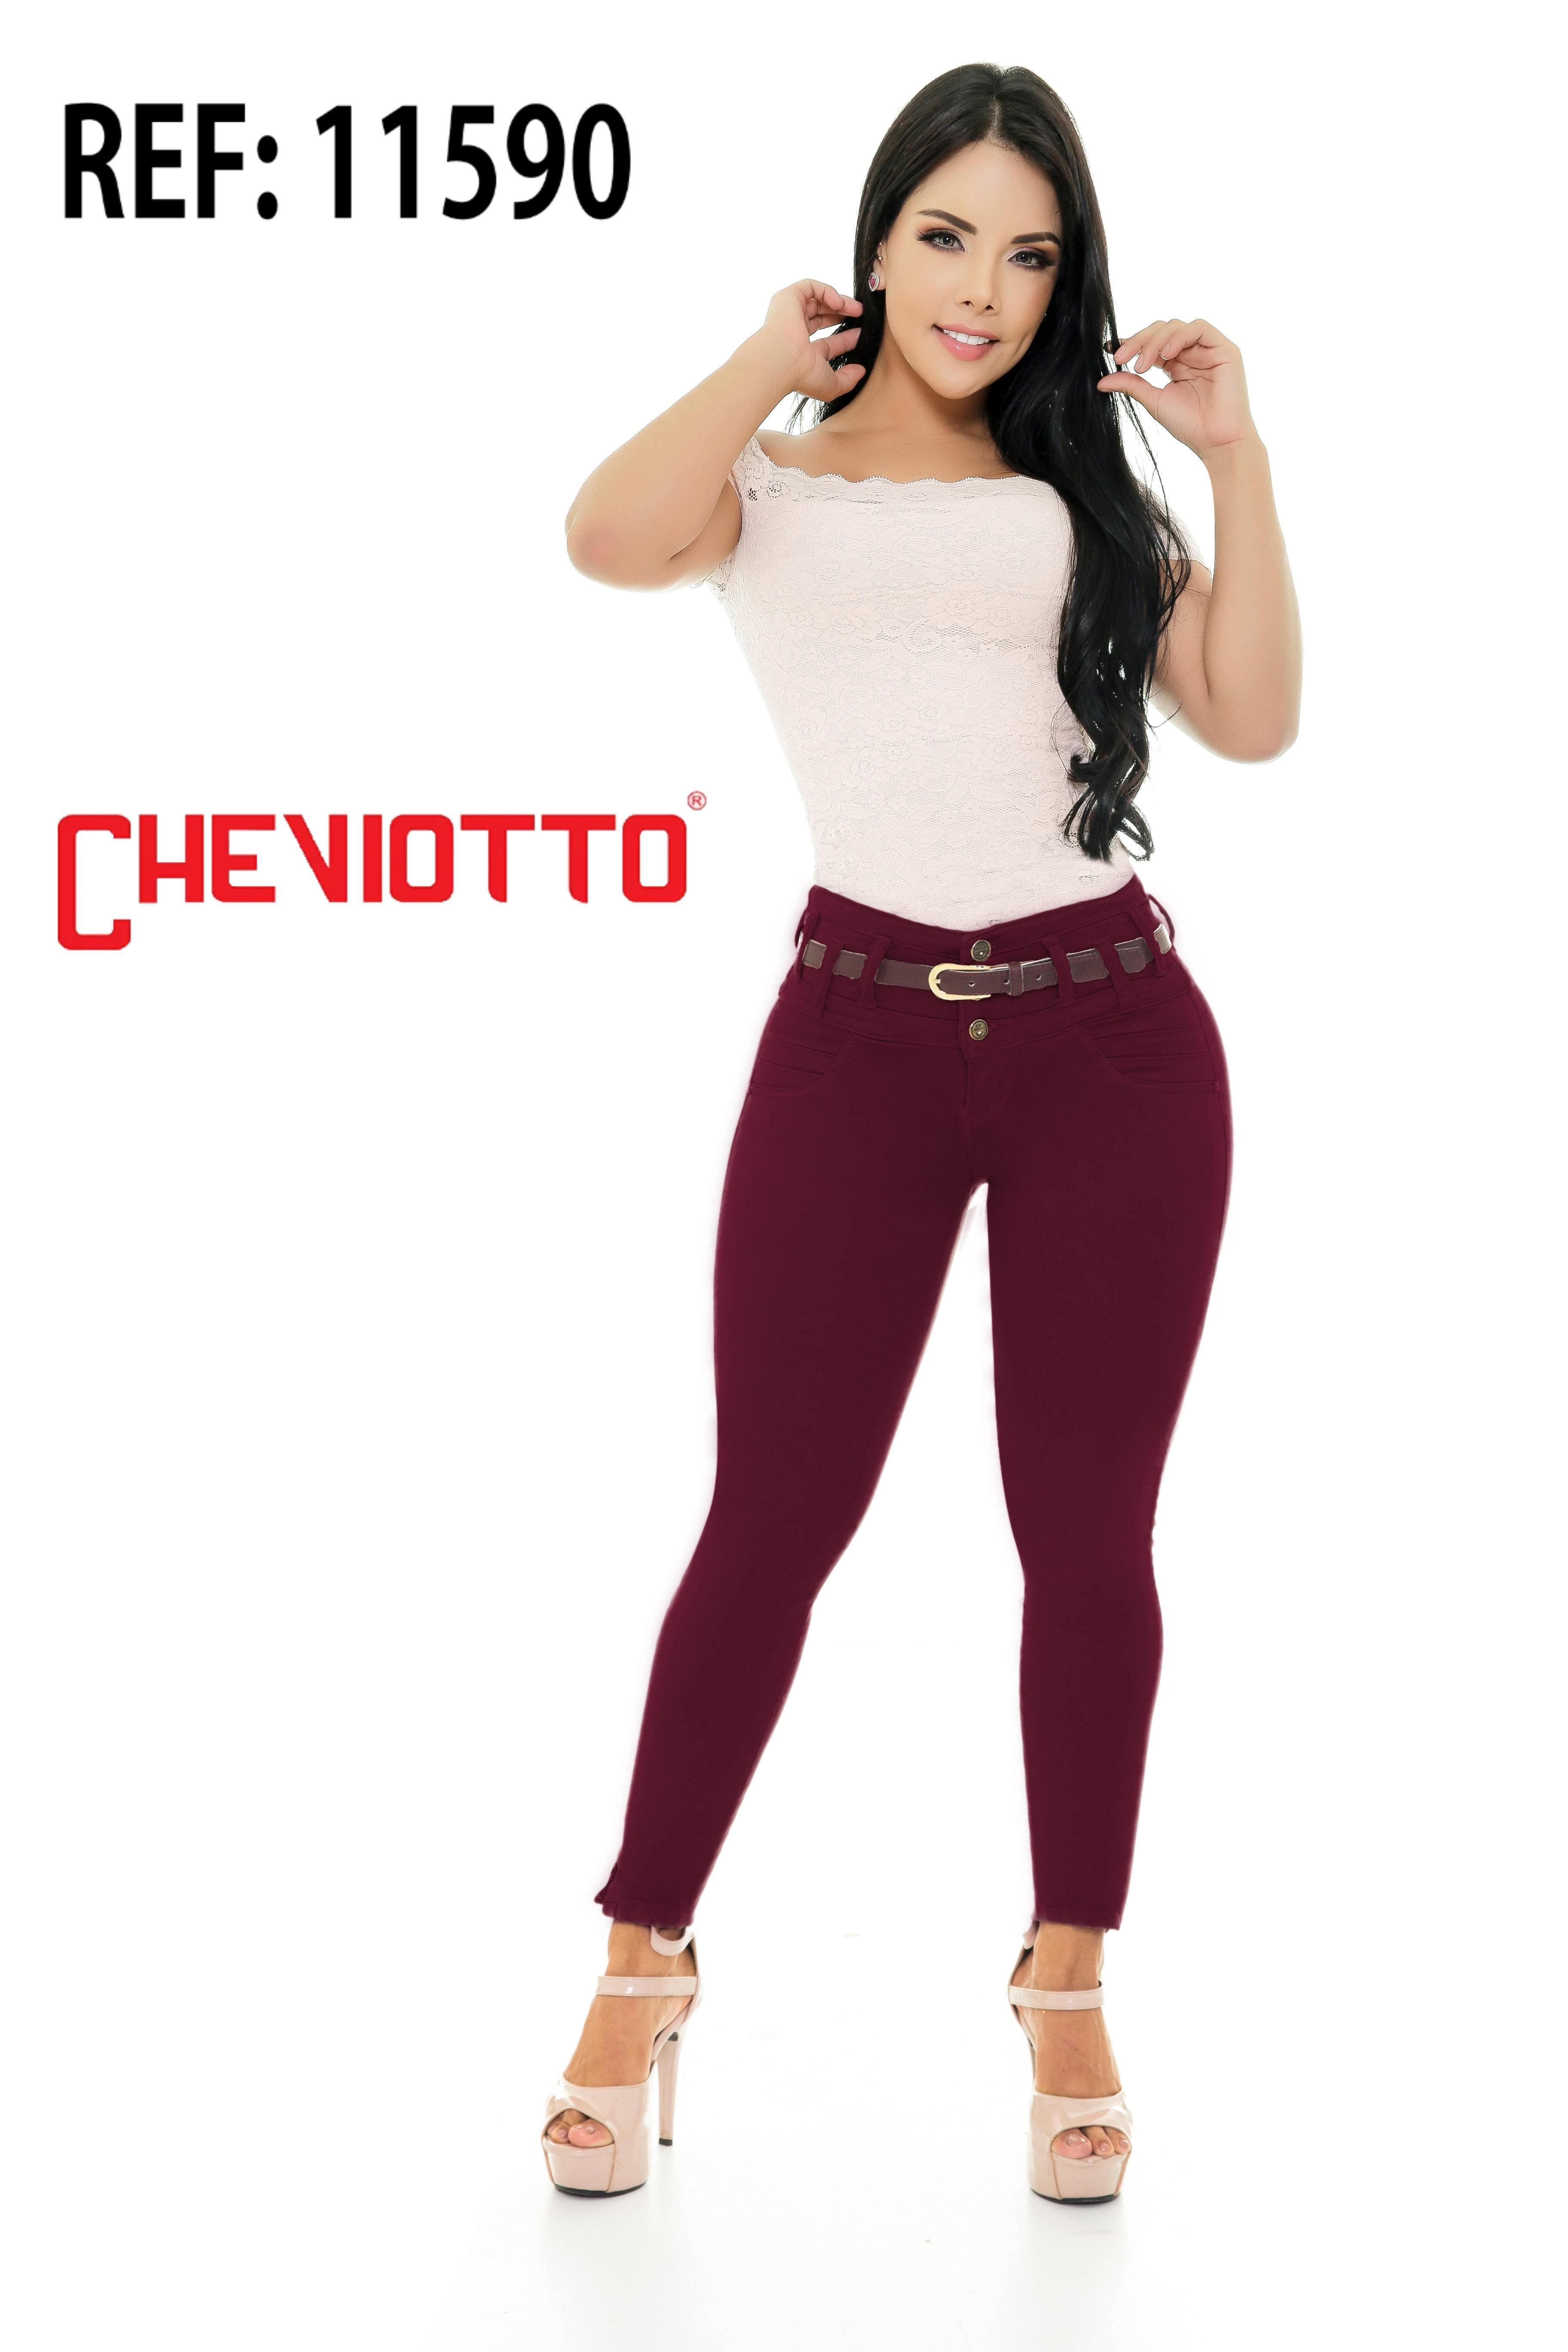 jeans de dama levantacola